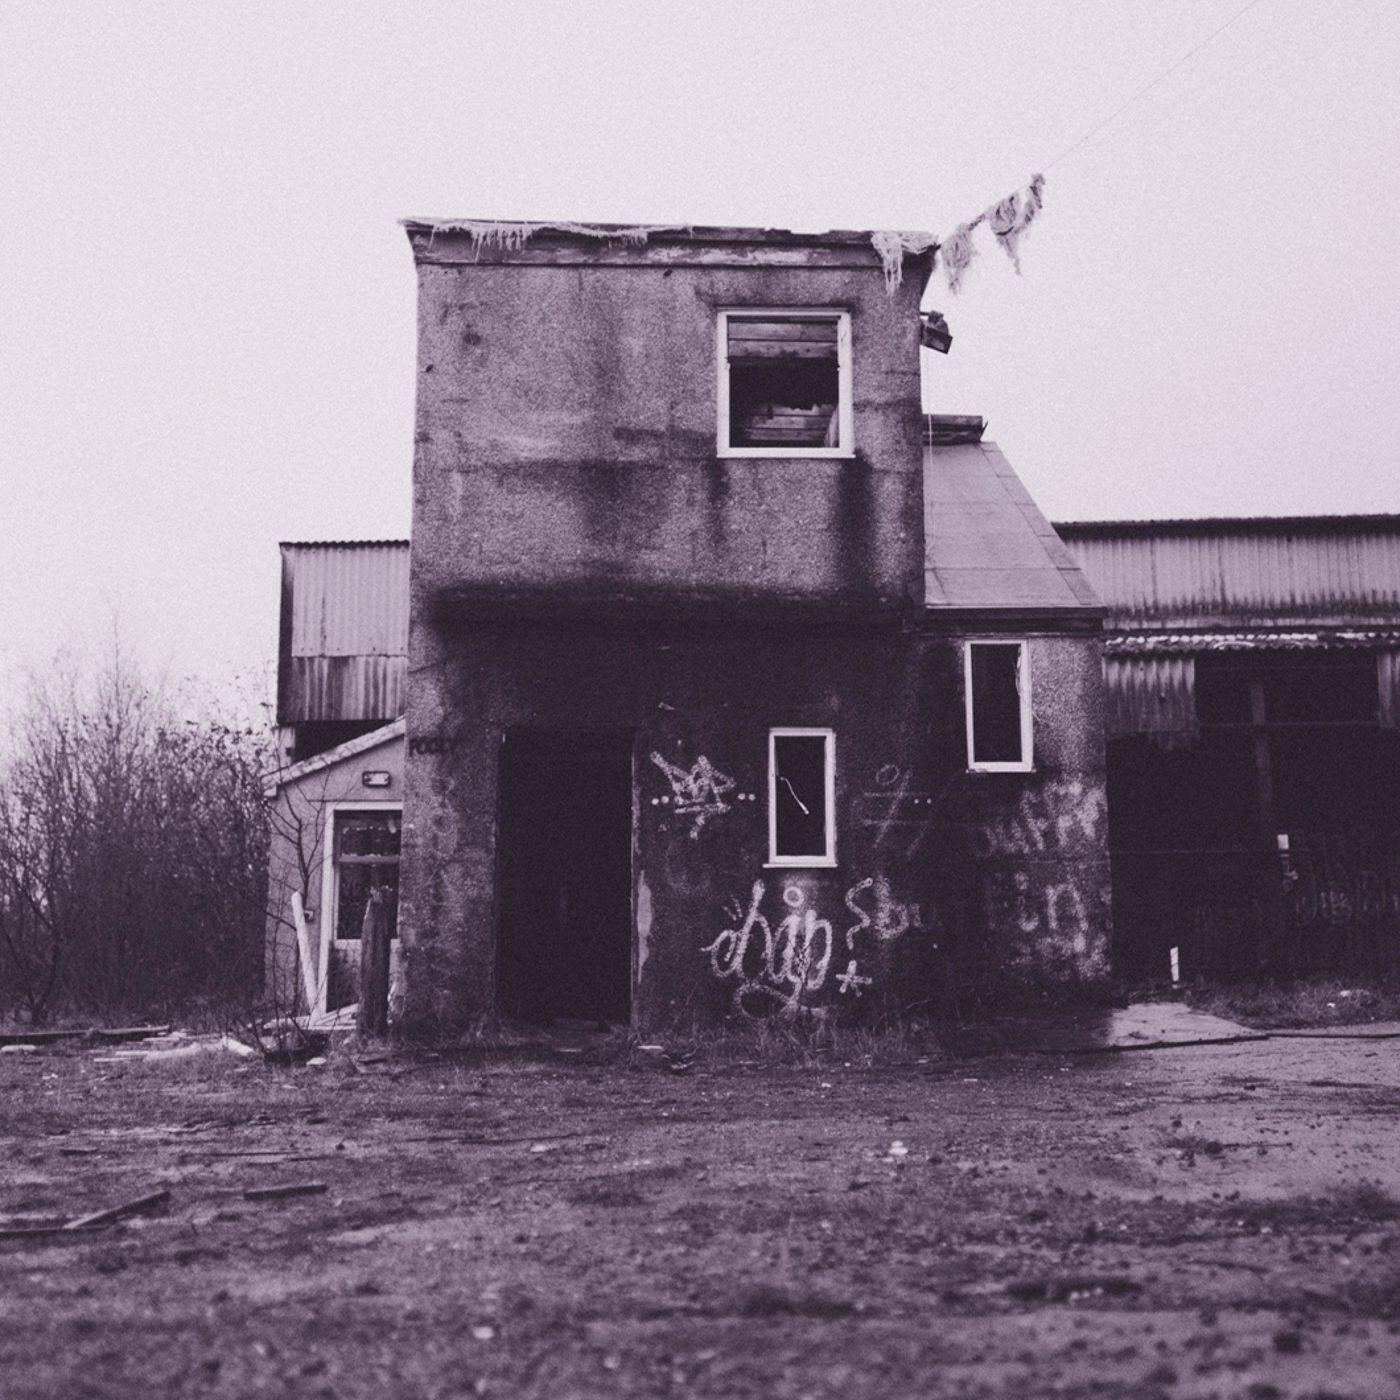 Defeatist UK - Closure [EP] (2021)